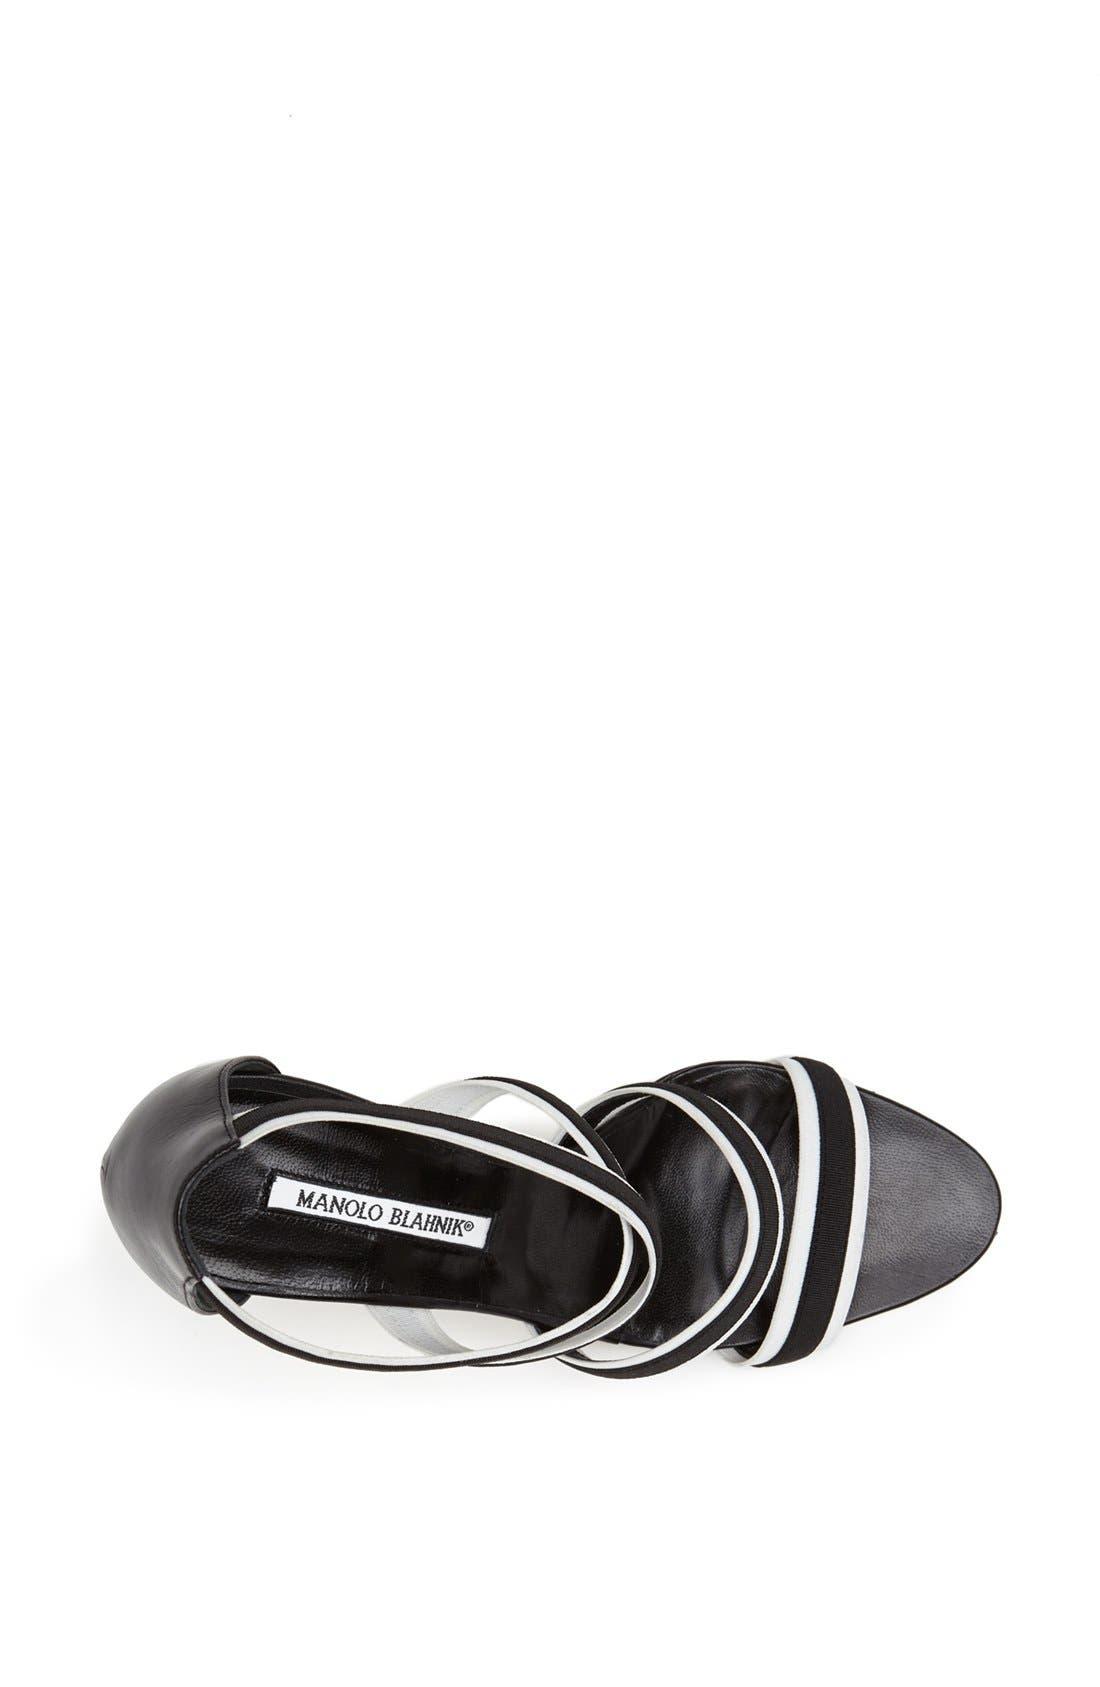 Alternate Image 3  - Manolo Blahnik 'Rigata' Sandal